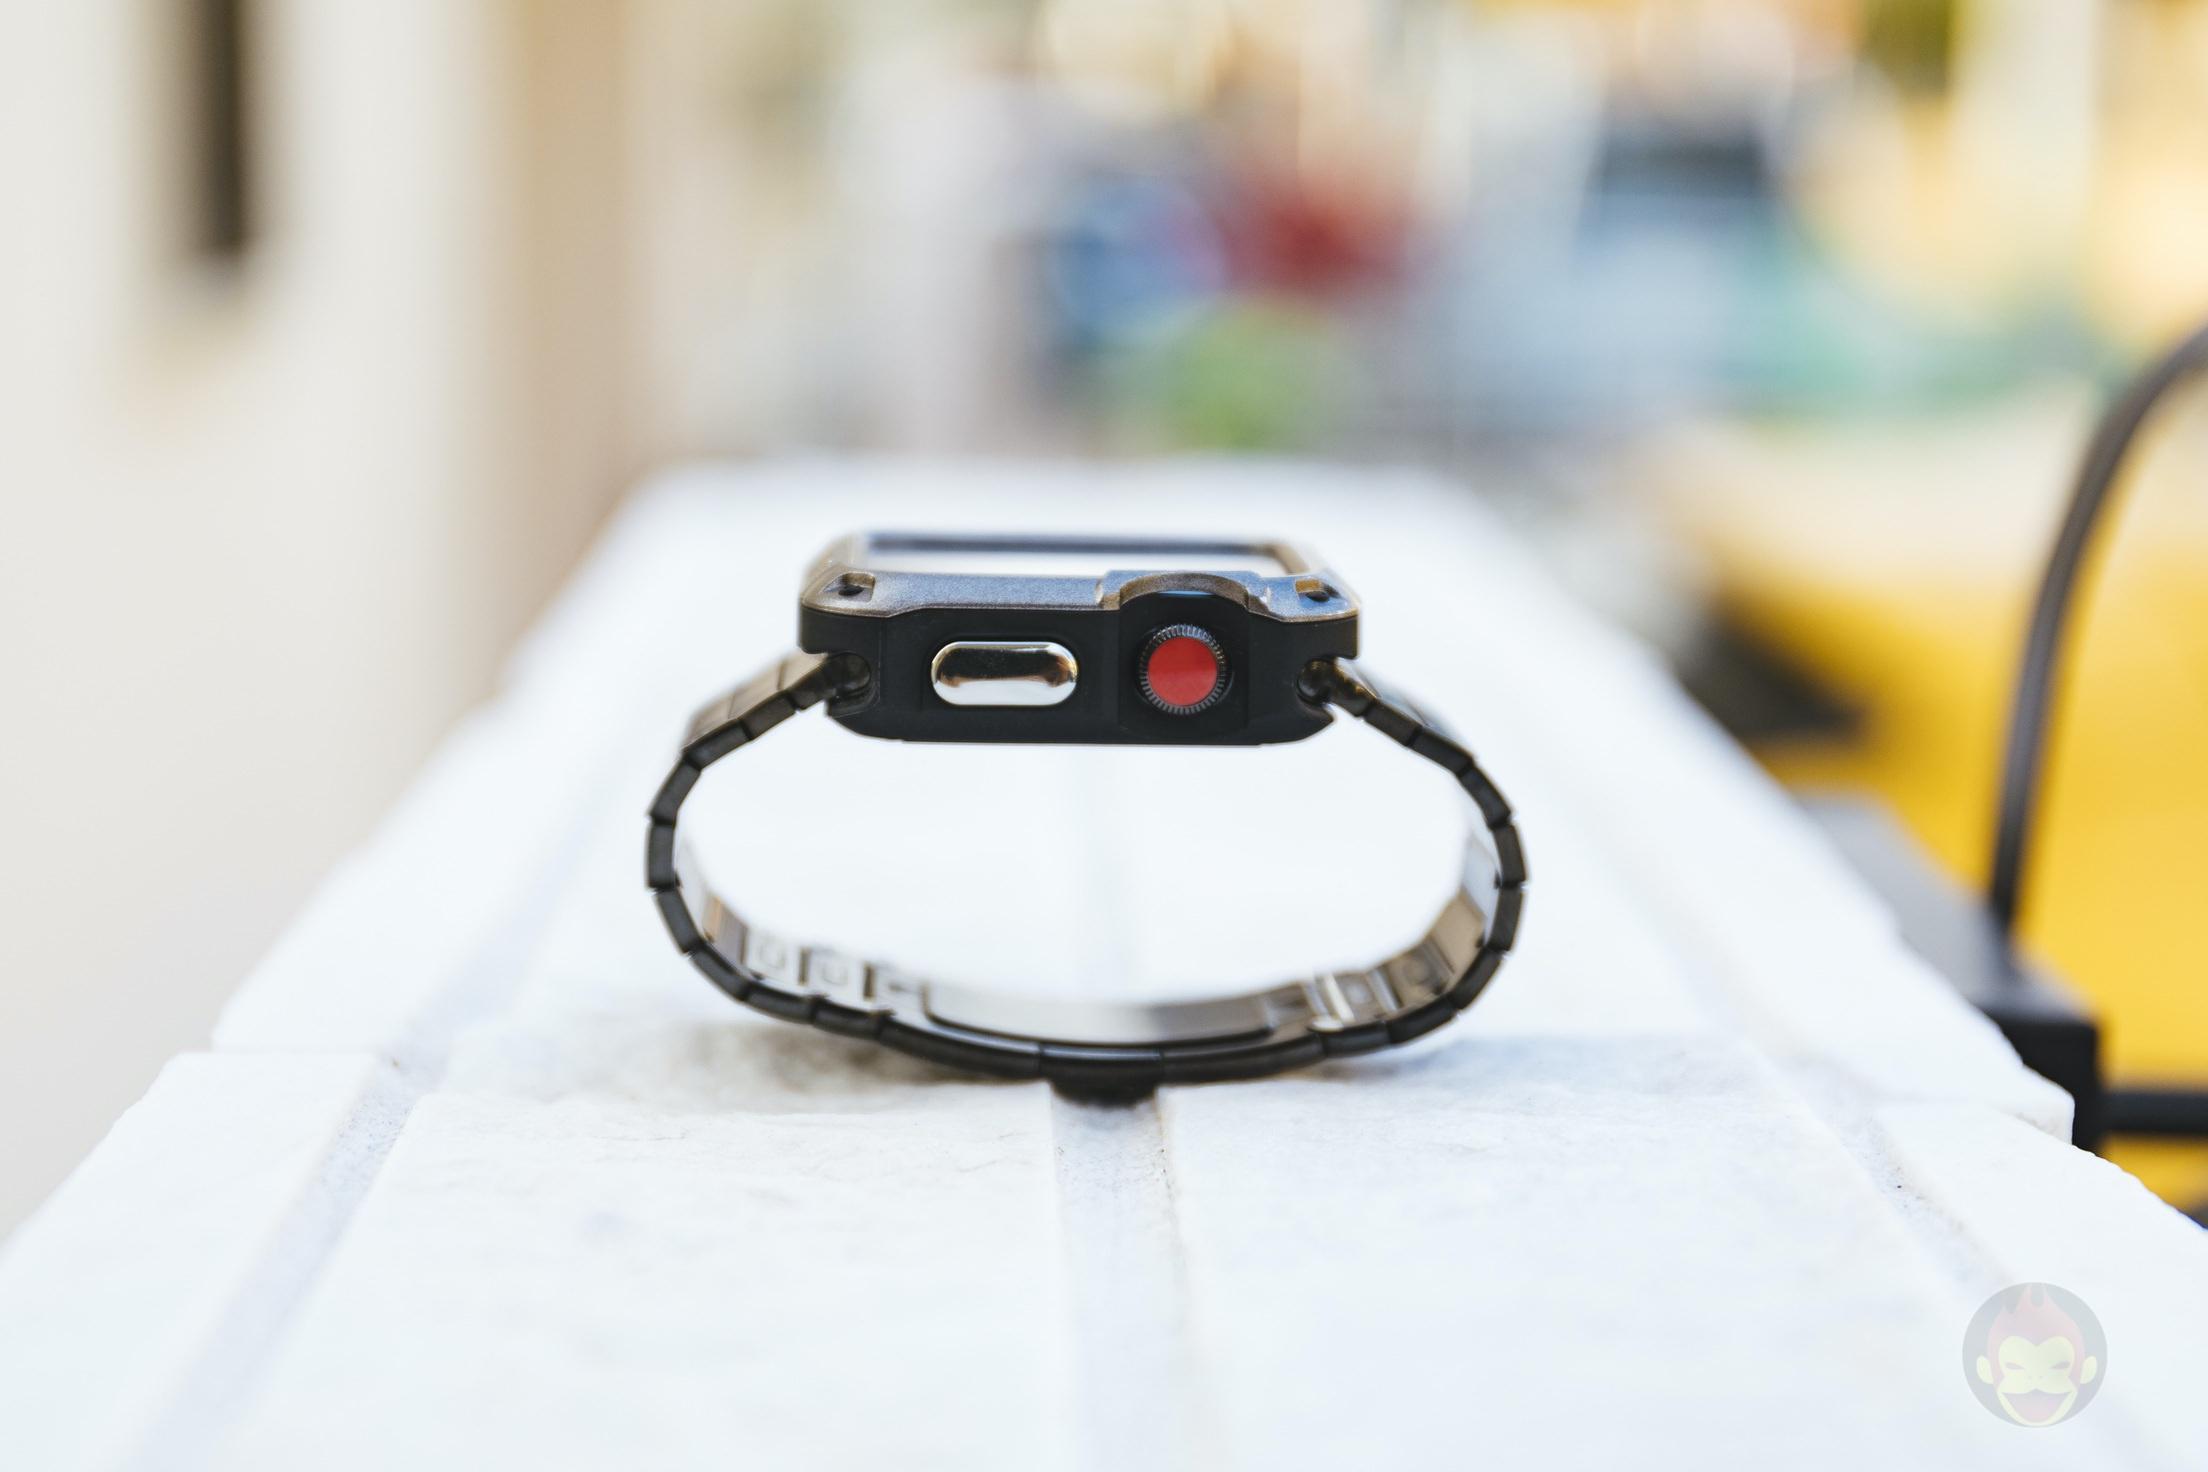 Apple-Watch-Series-3-LTE-Review-05.jpg